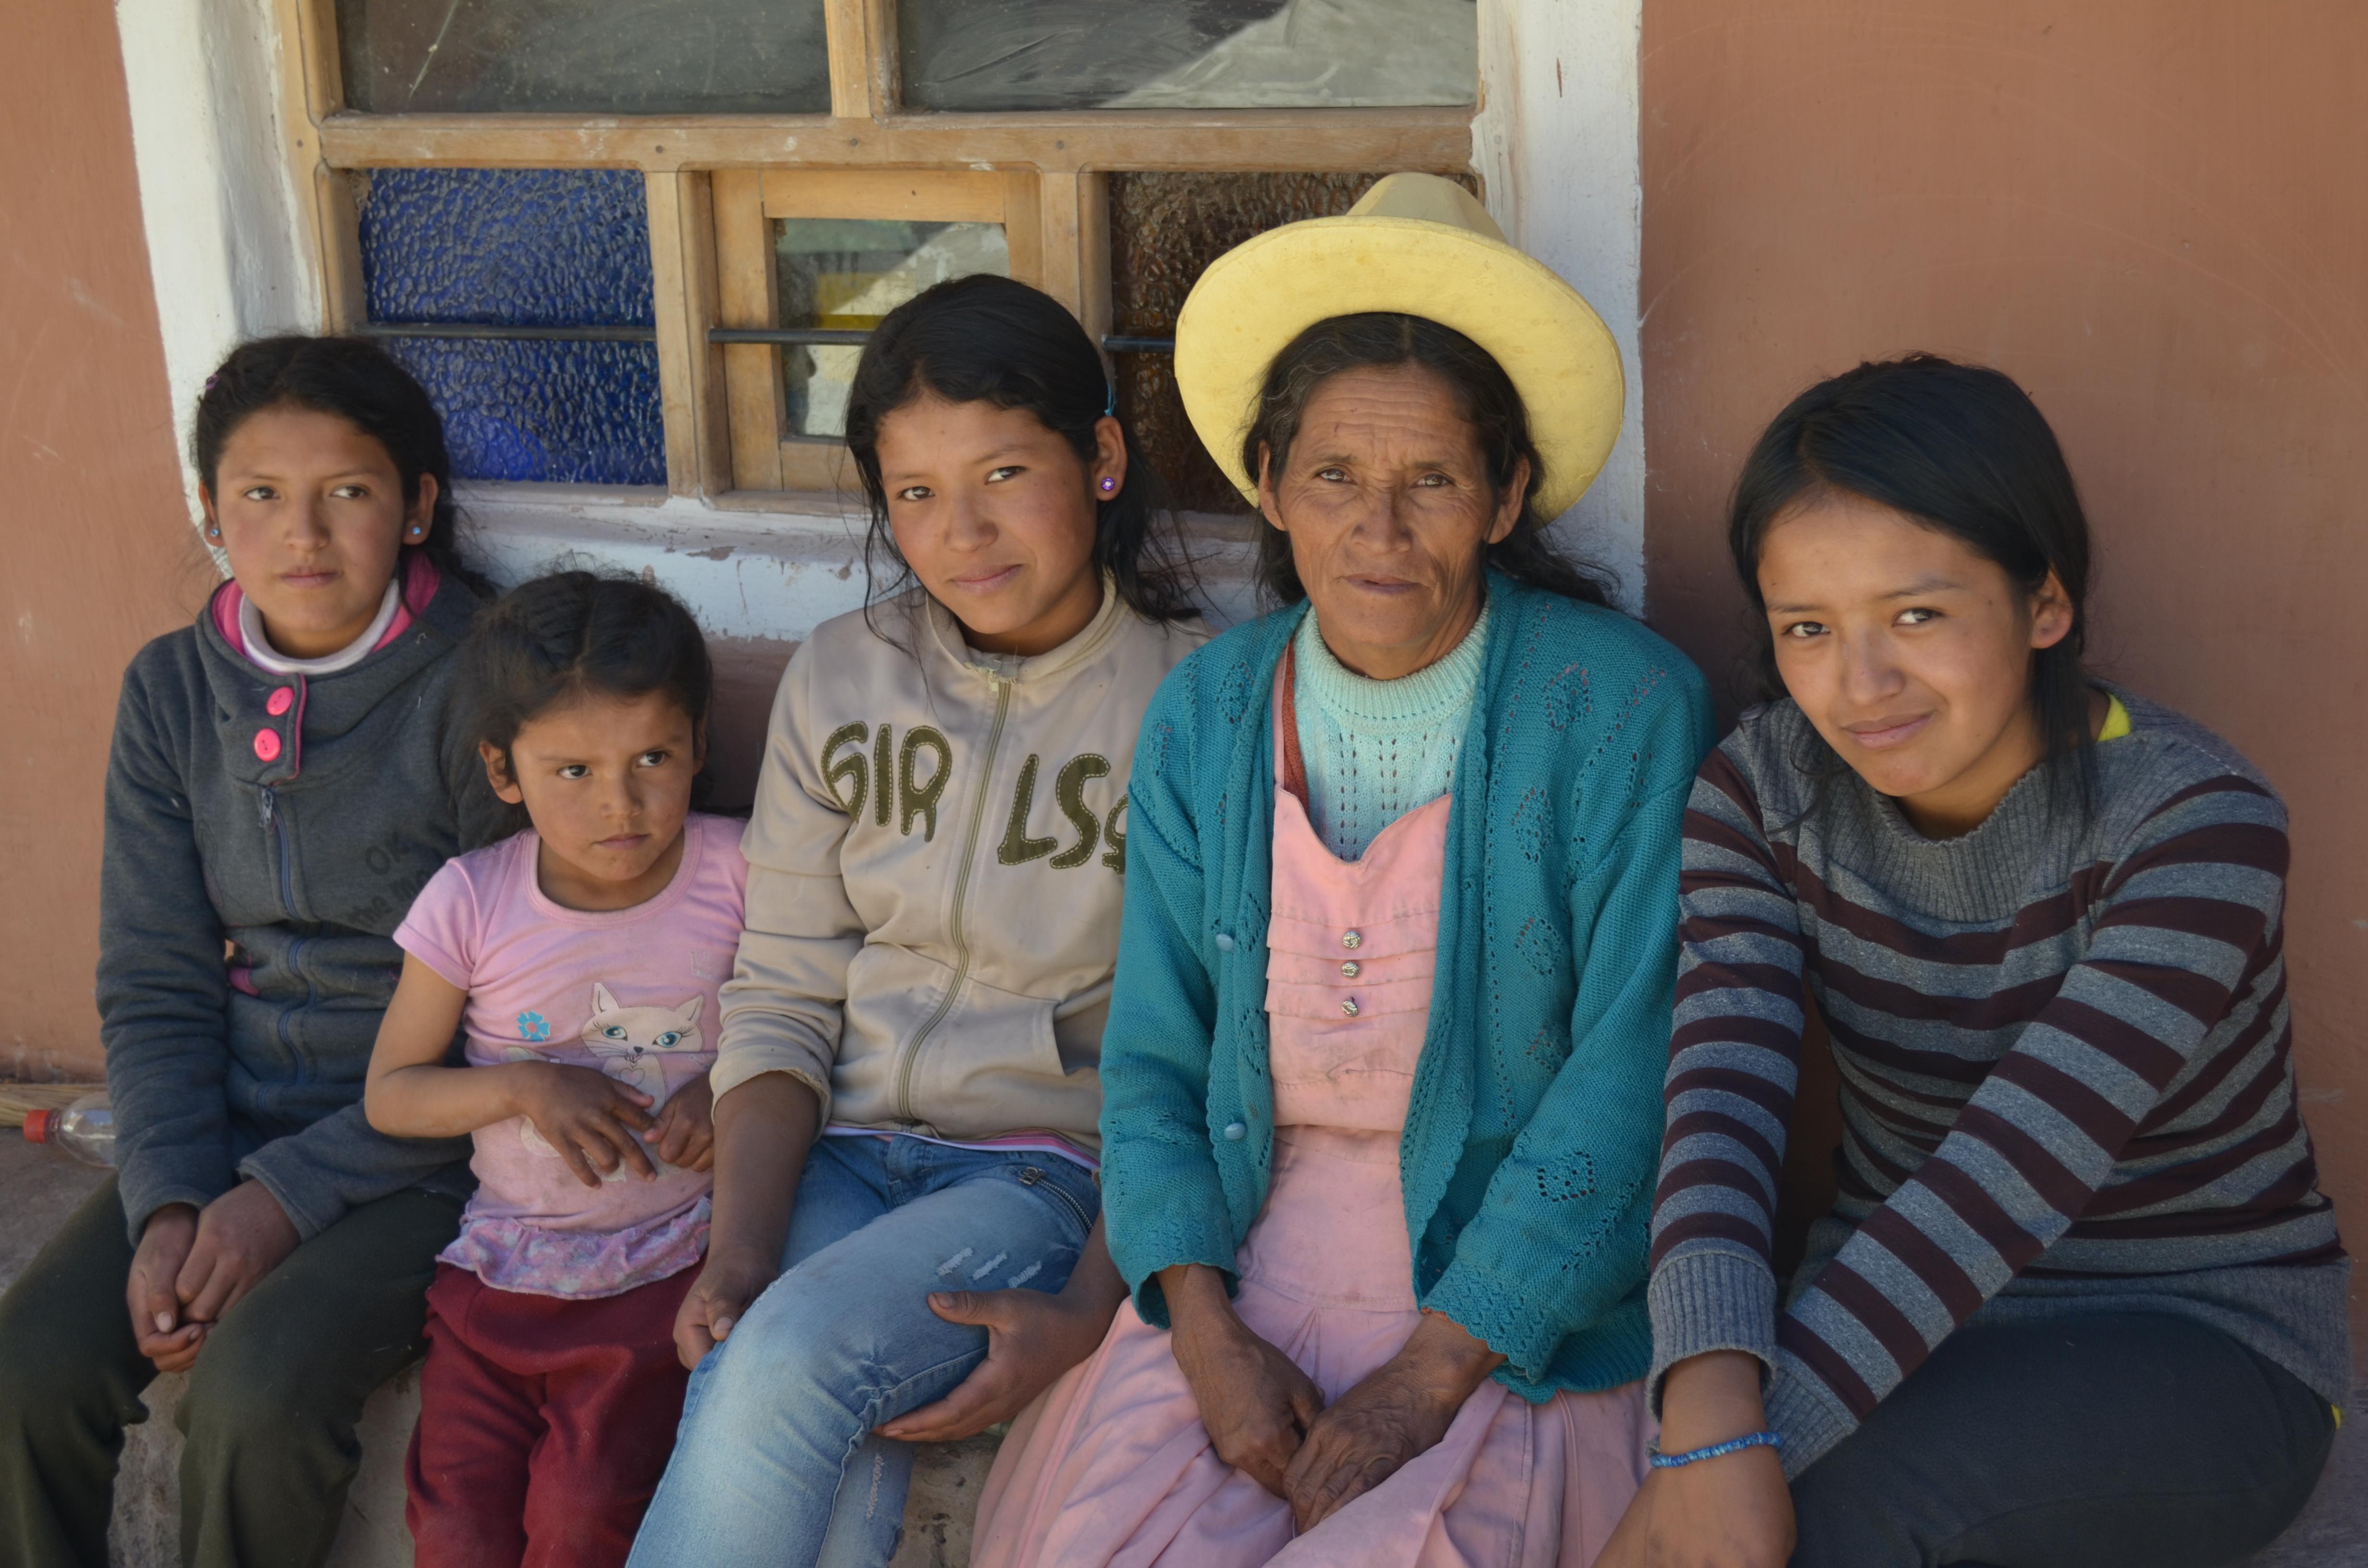 Fiorela's family